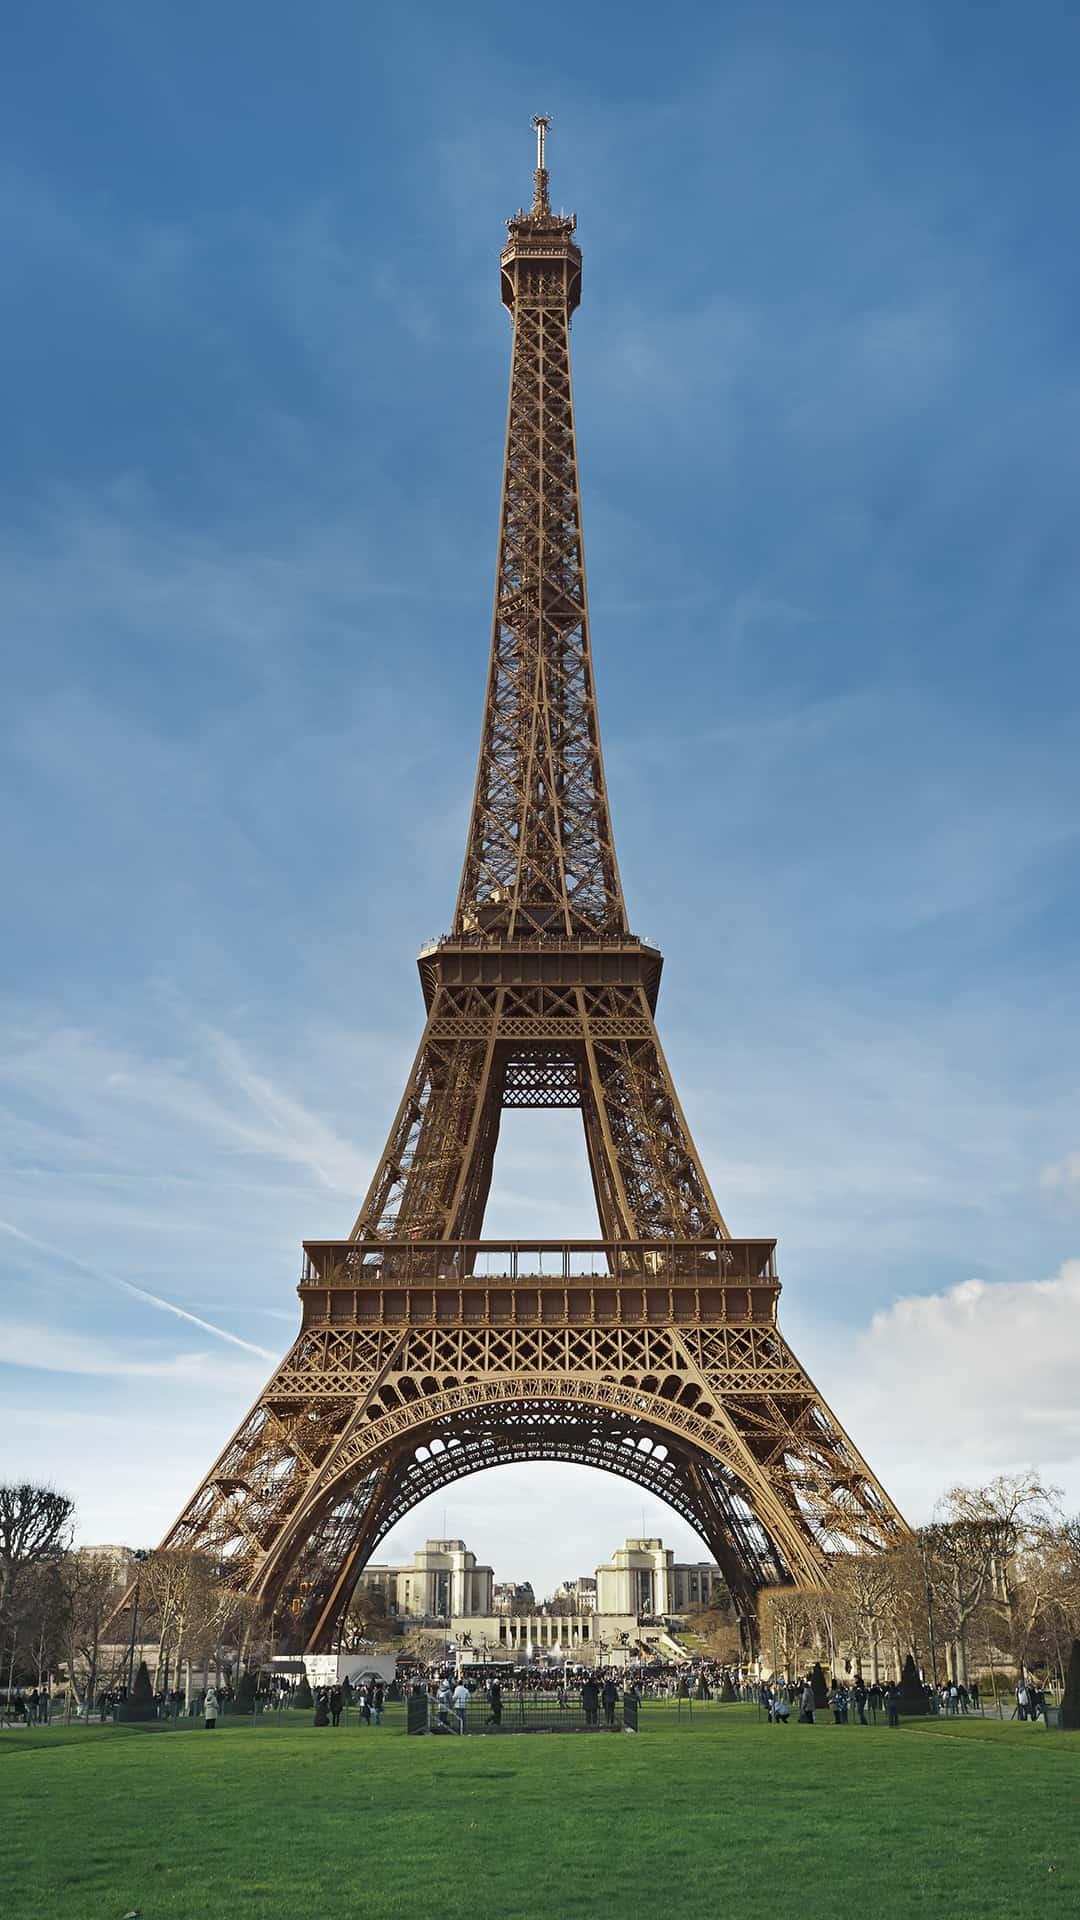 Eiffel Tower Paris France Blue Sky Android Wallpaper